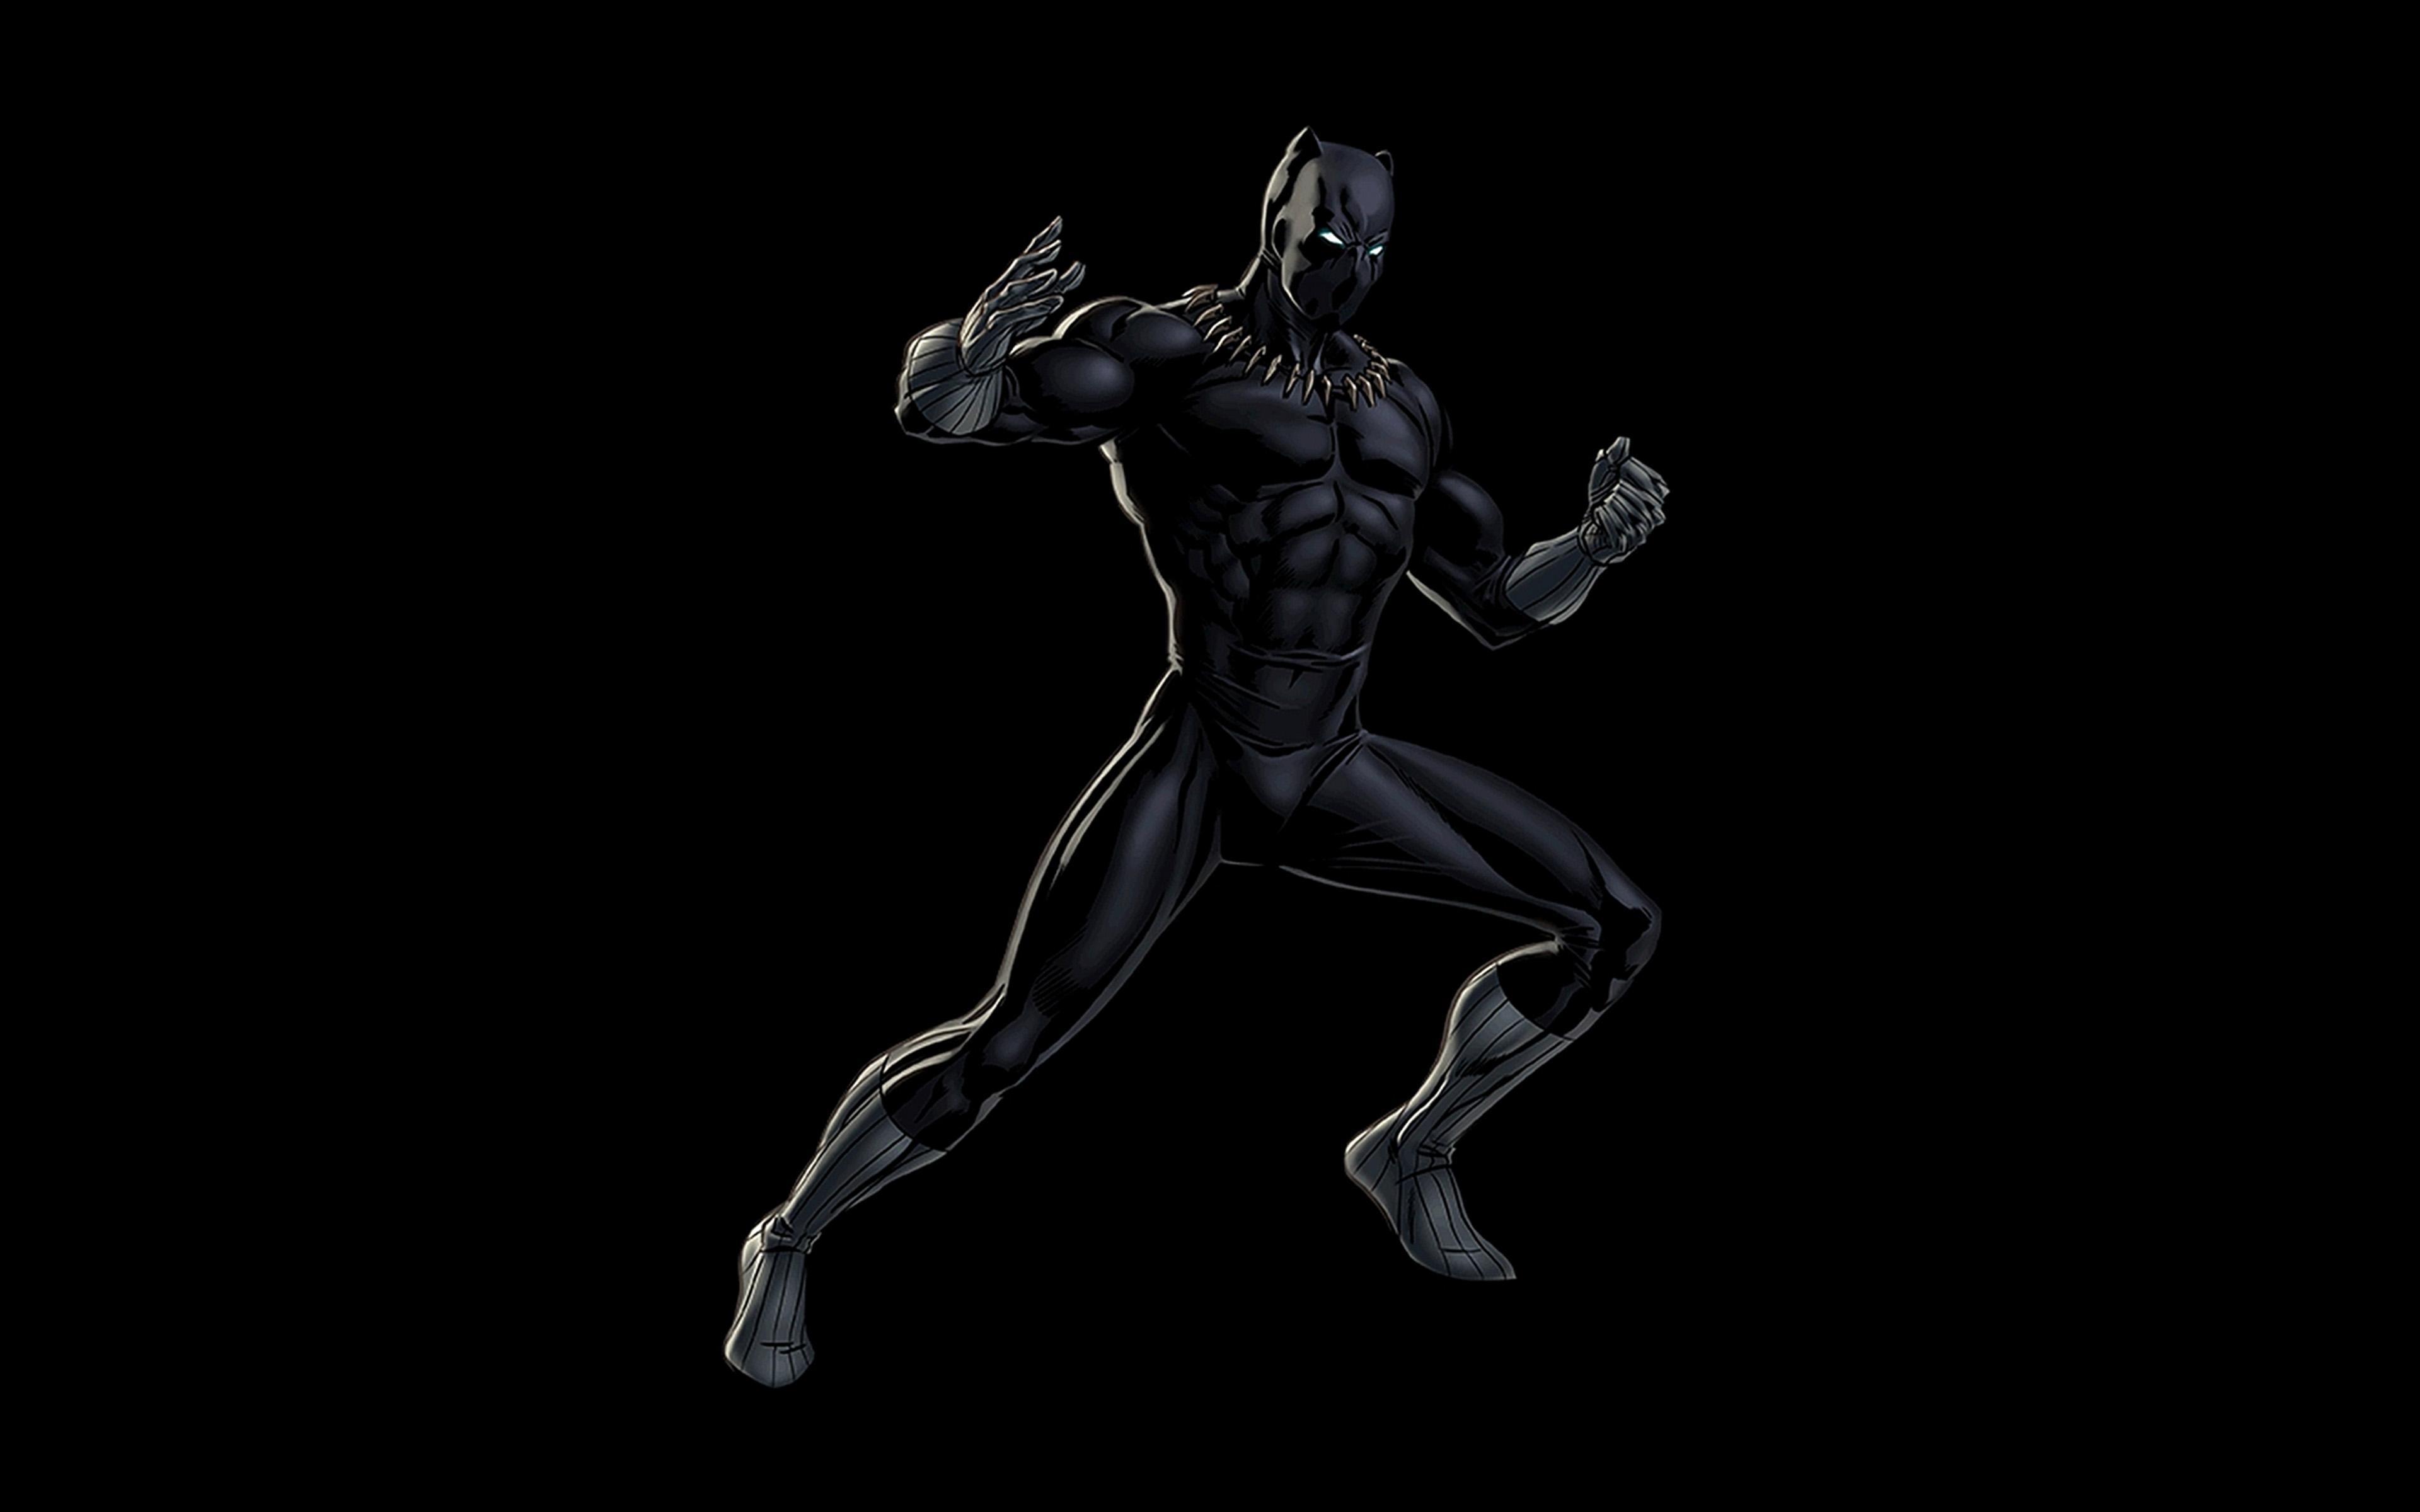 Bd91 Hero Marvel Blackpanther Dark Art Illustration Wallpaper